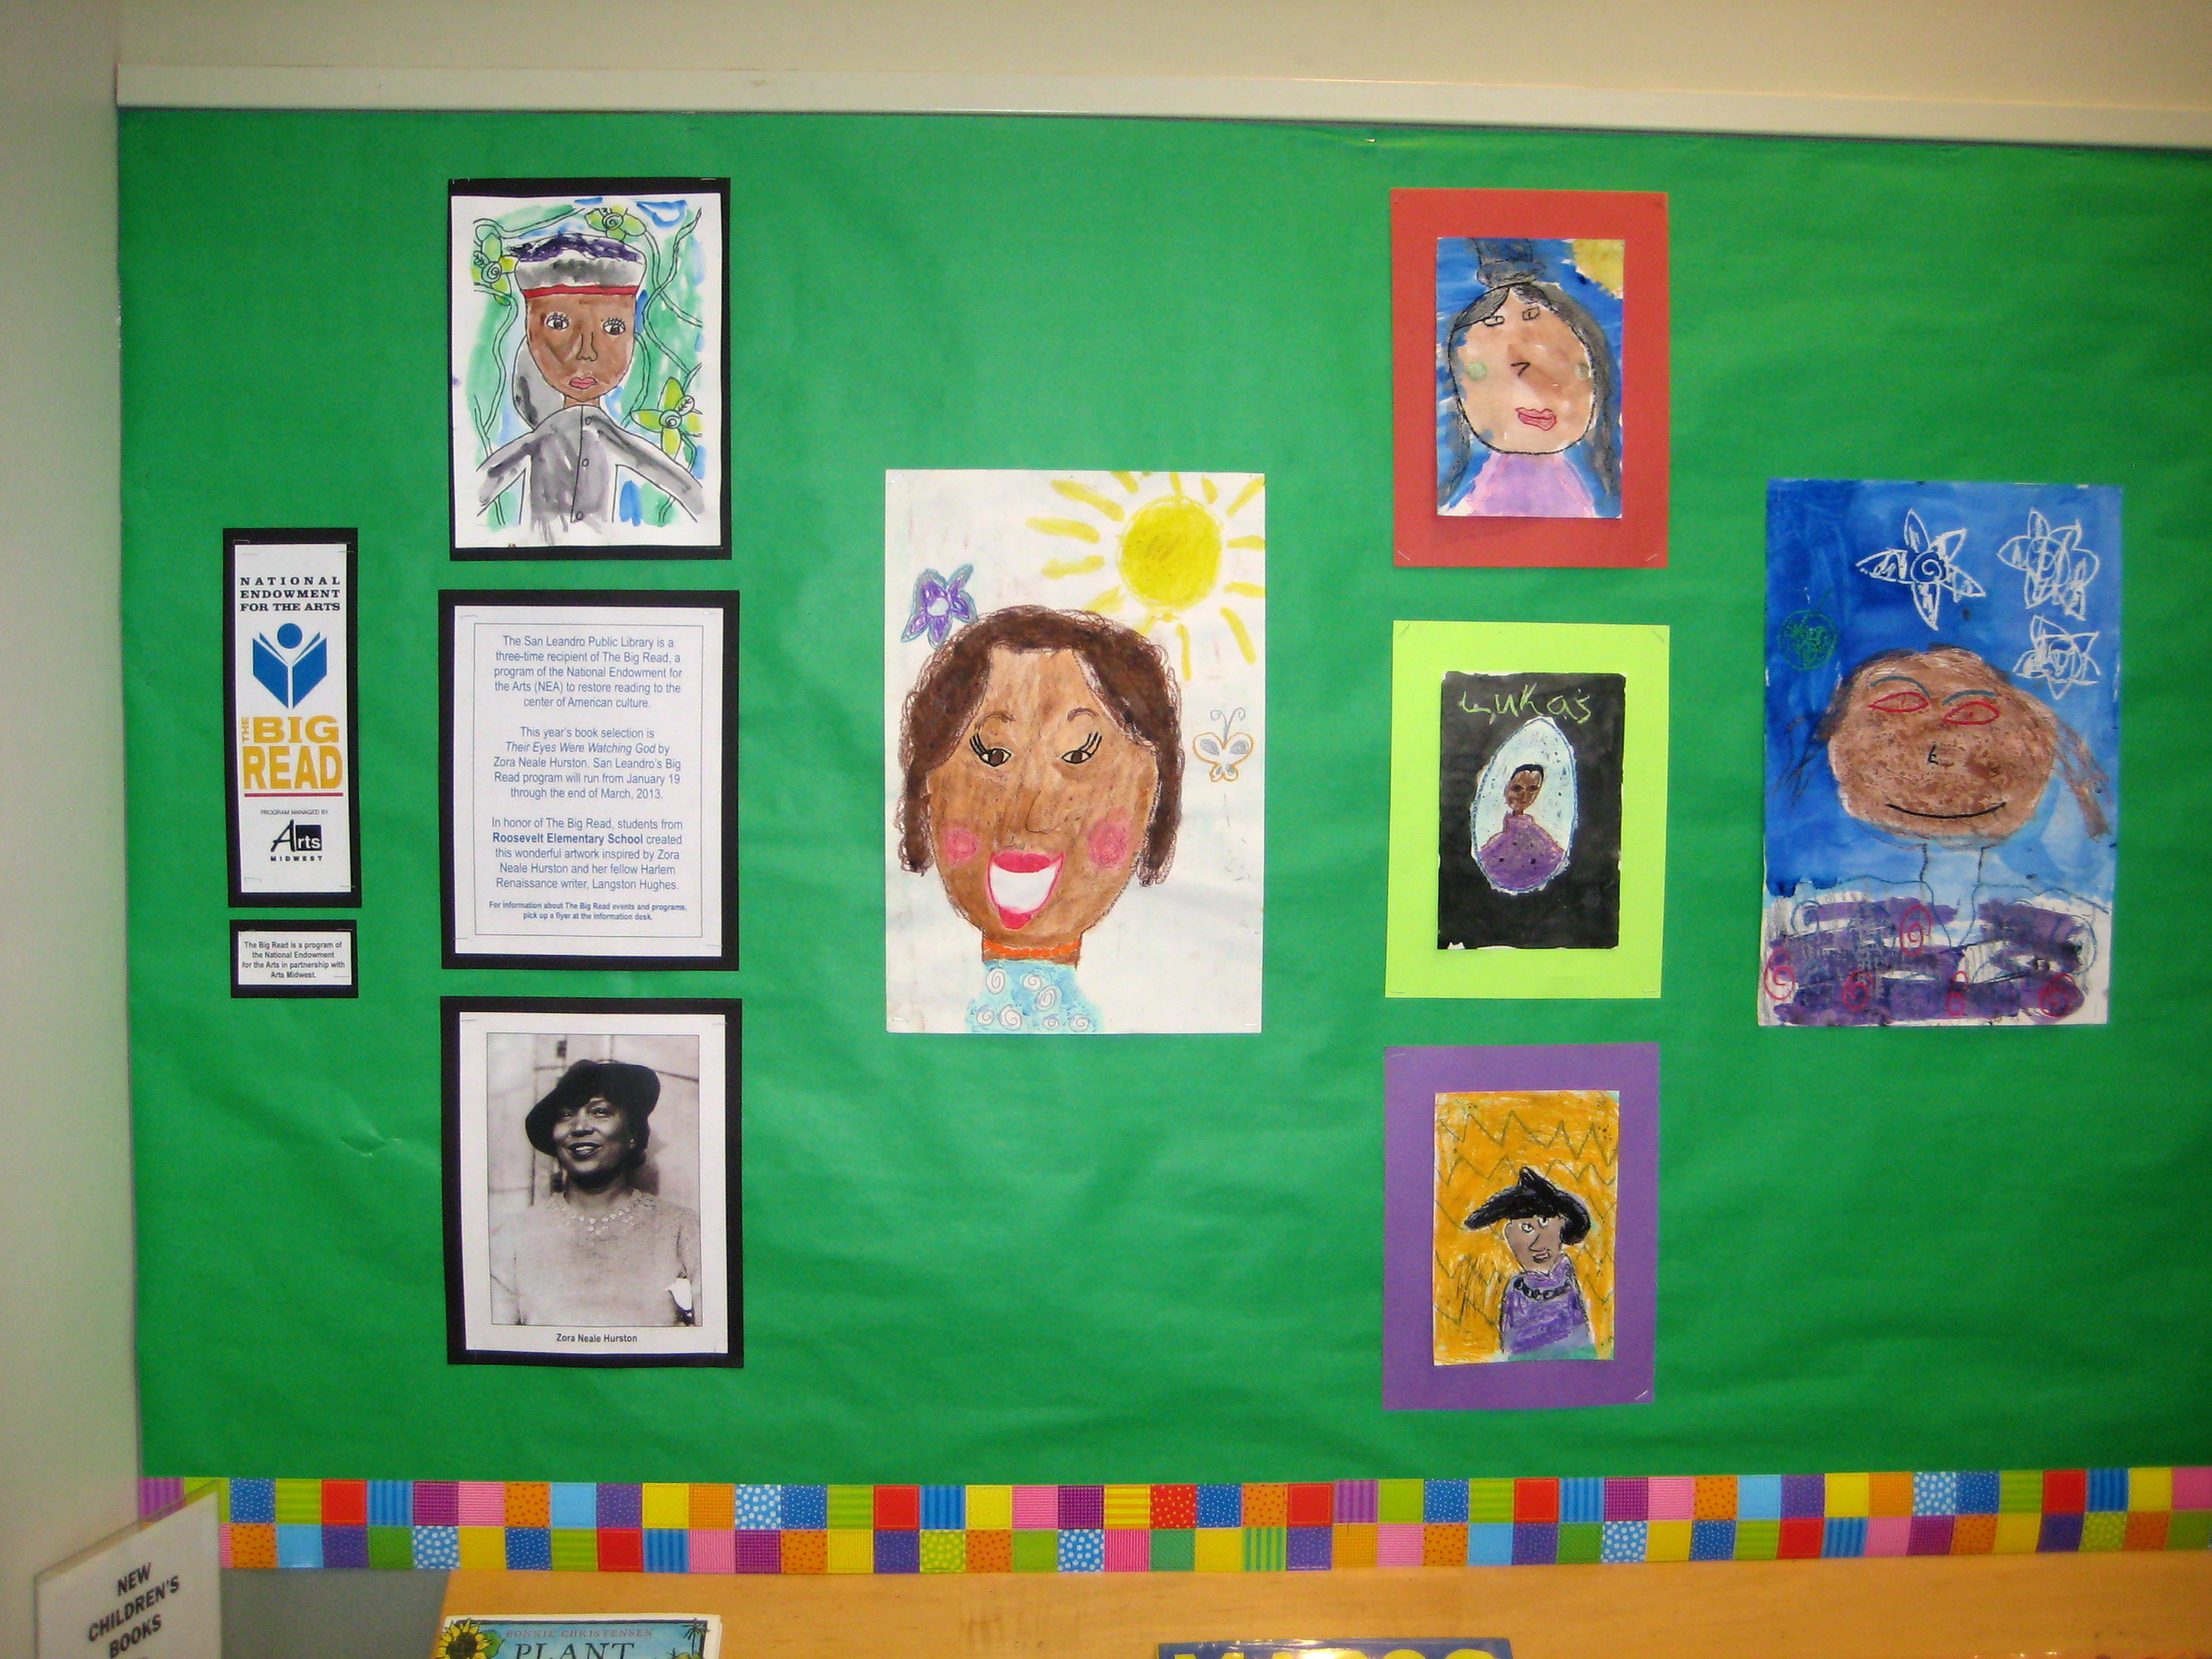 4th & 5th Grade Portraits of Zora Neale Hurston